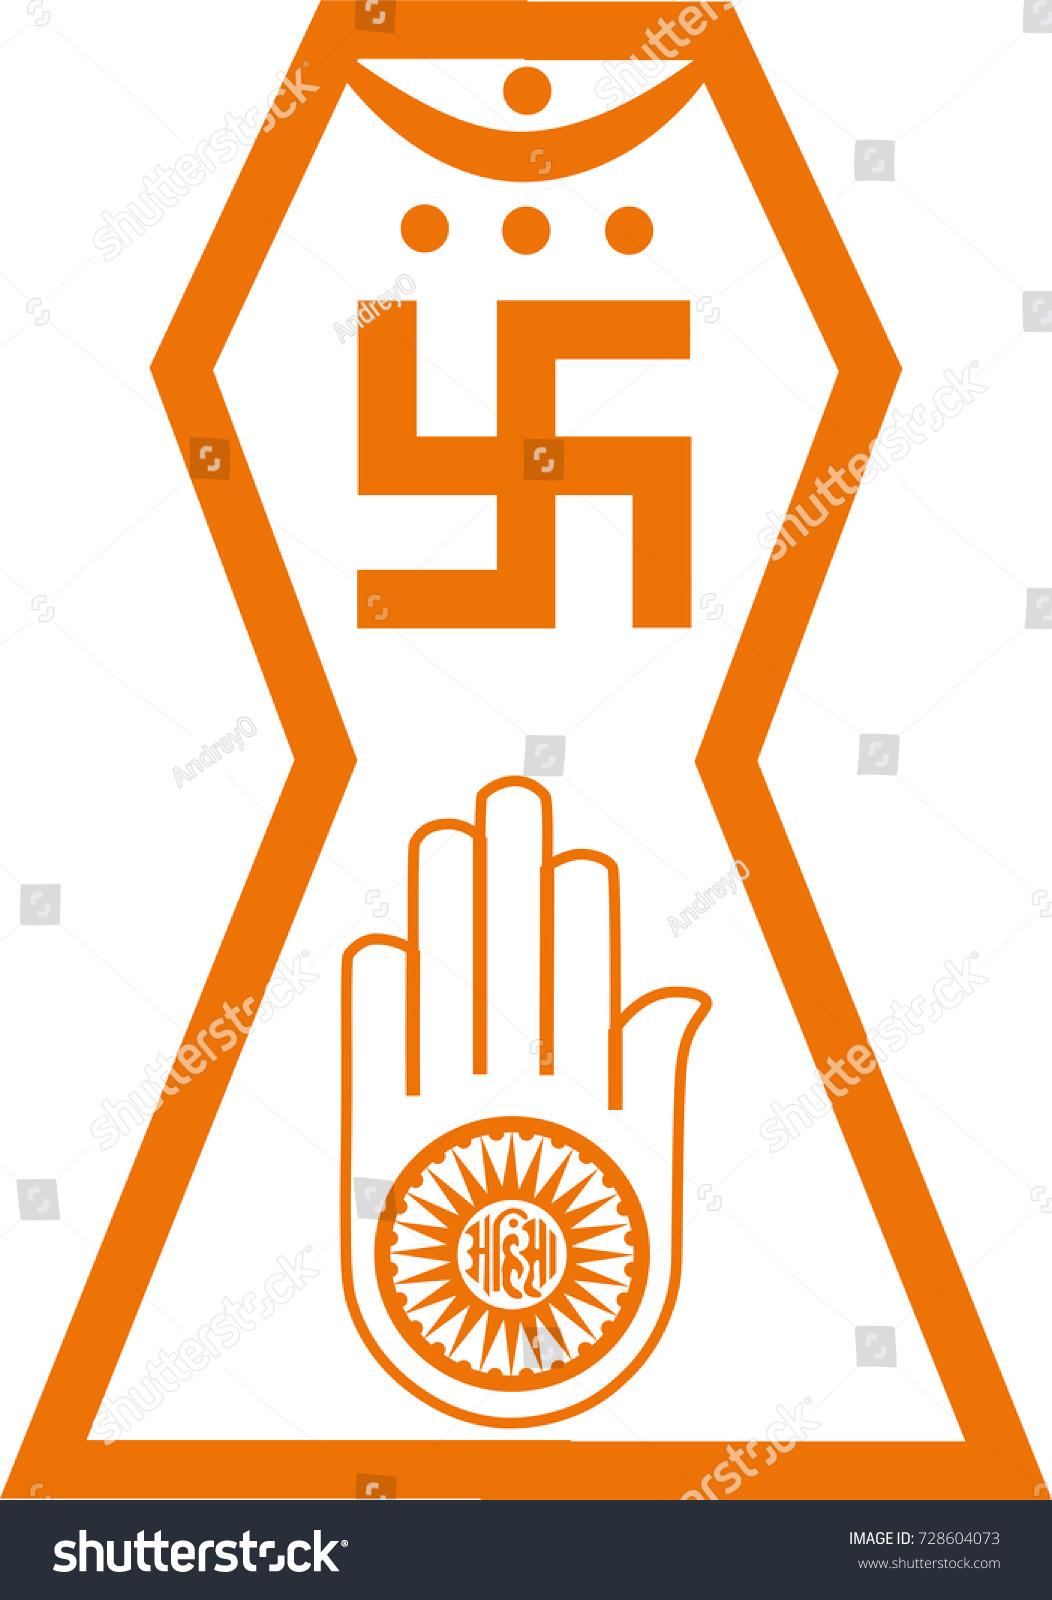 Vector Symbol Jainism Religion Stock Vector Royalty Free 728604073